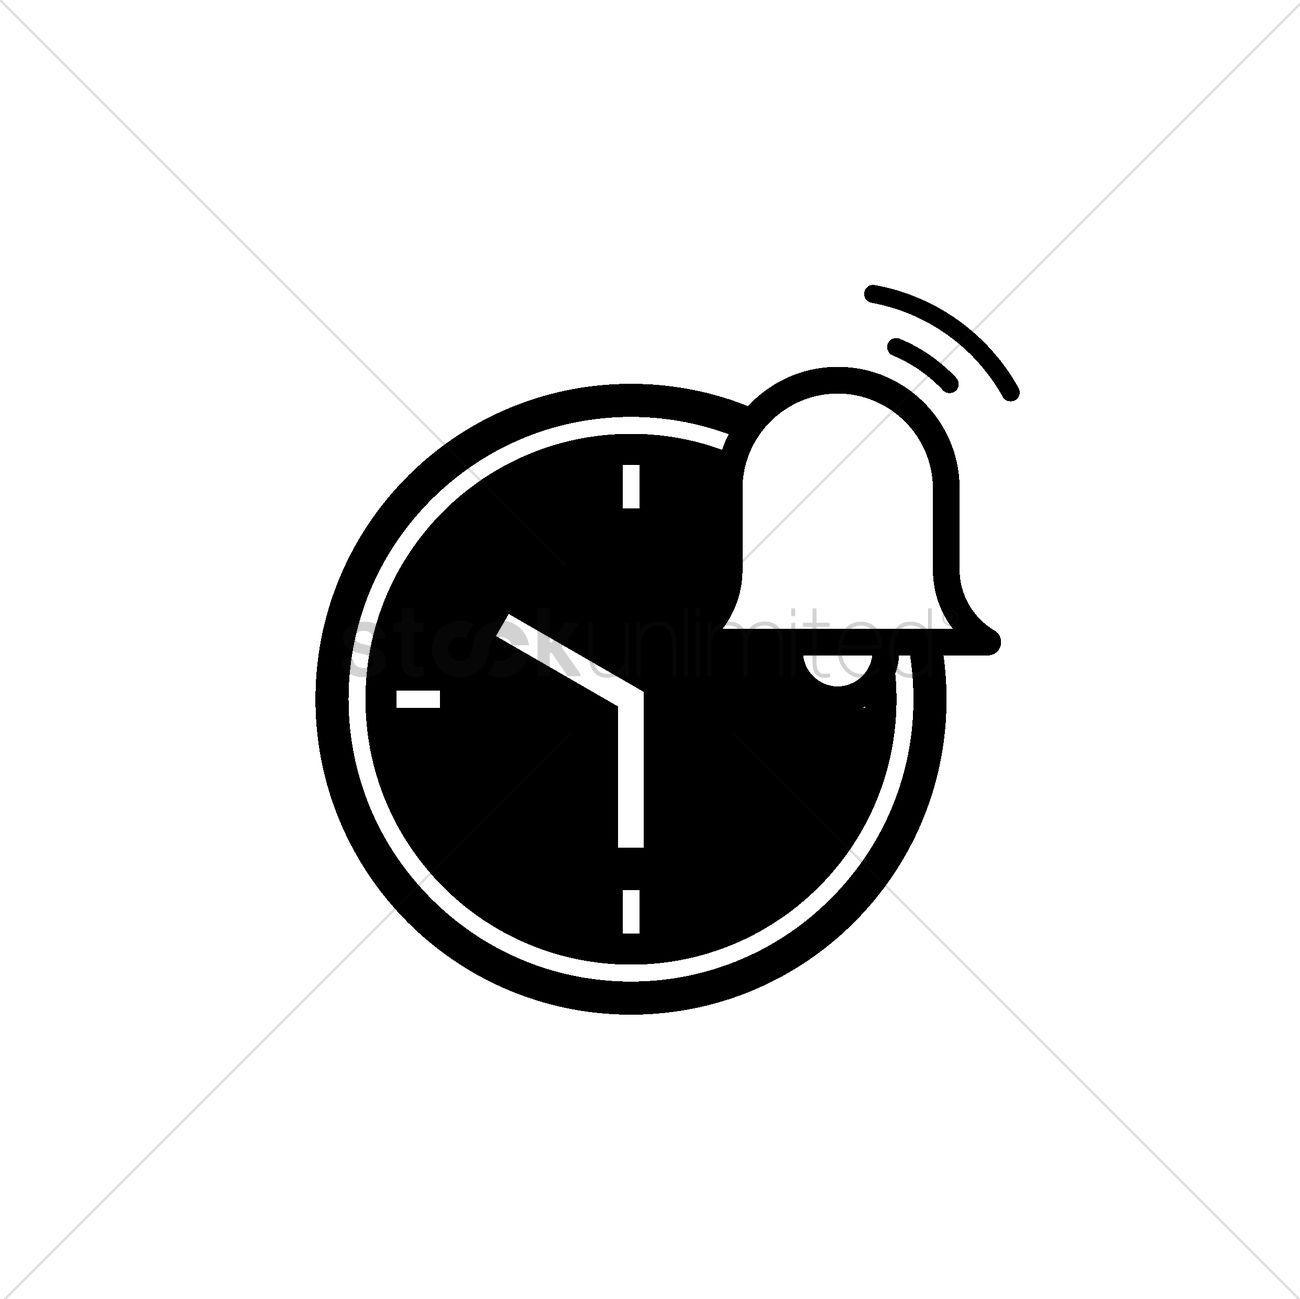 Alarm clock icon Vector Image - 2006521 | StockUnlimited